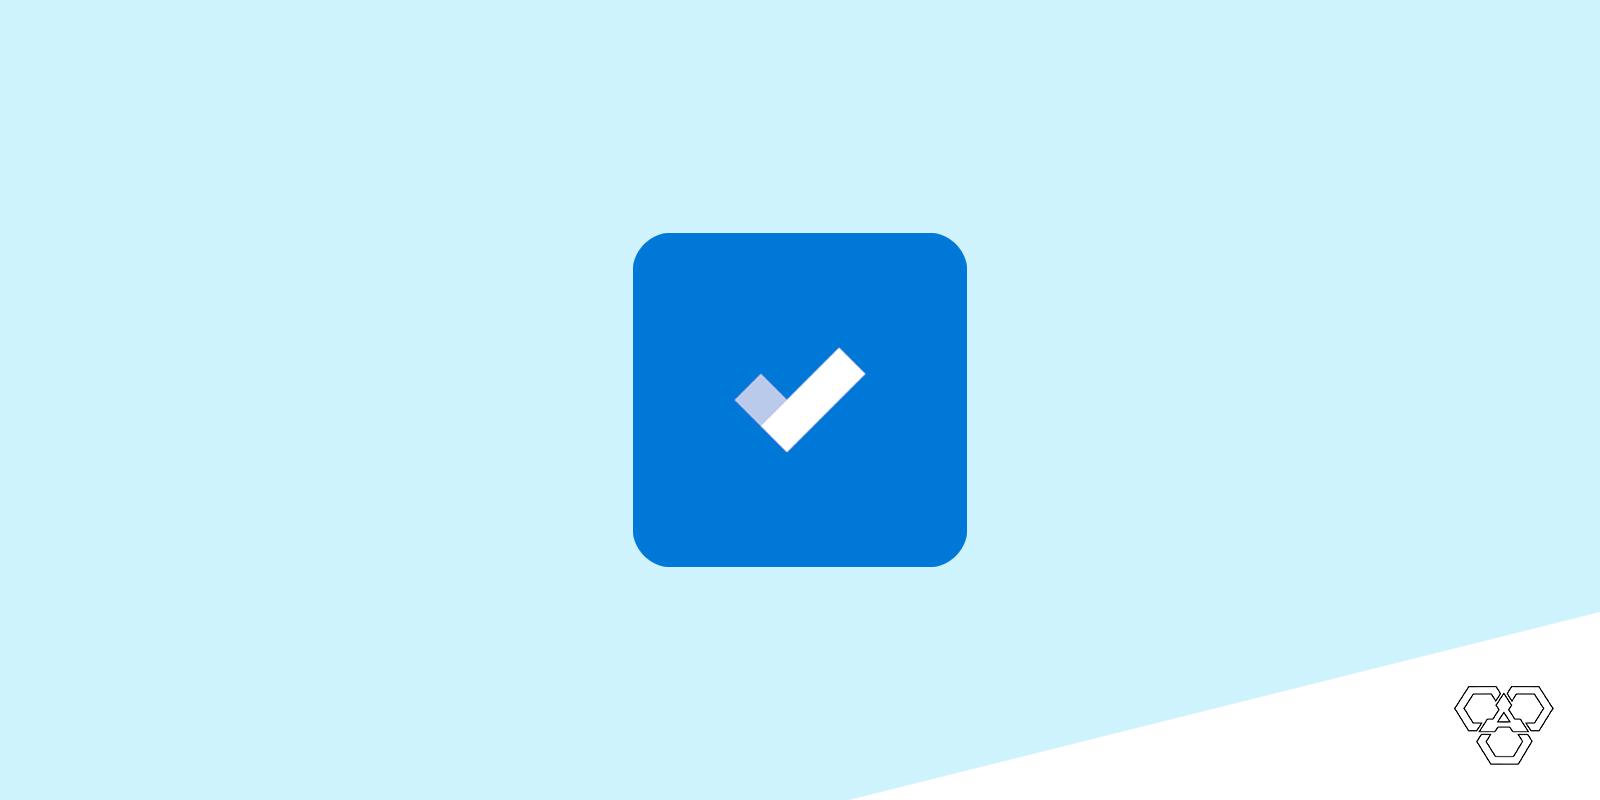 Microsoft To Do list app